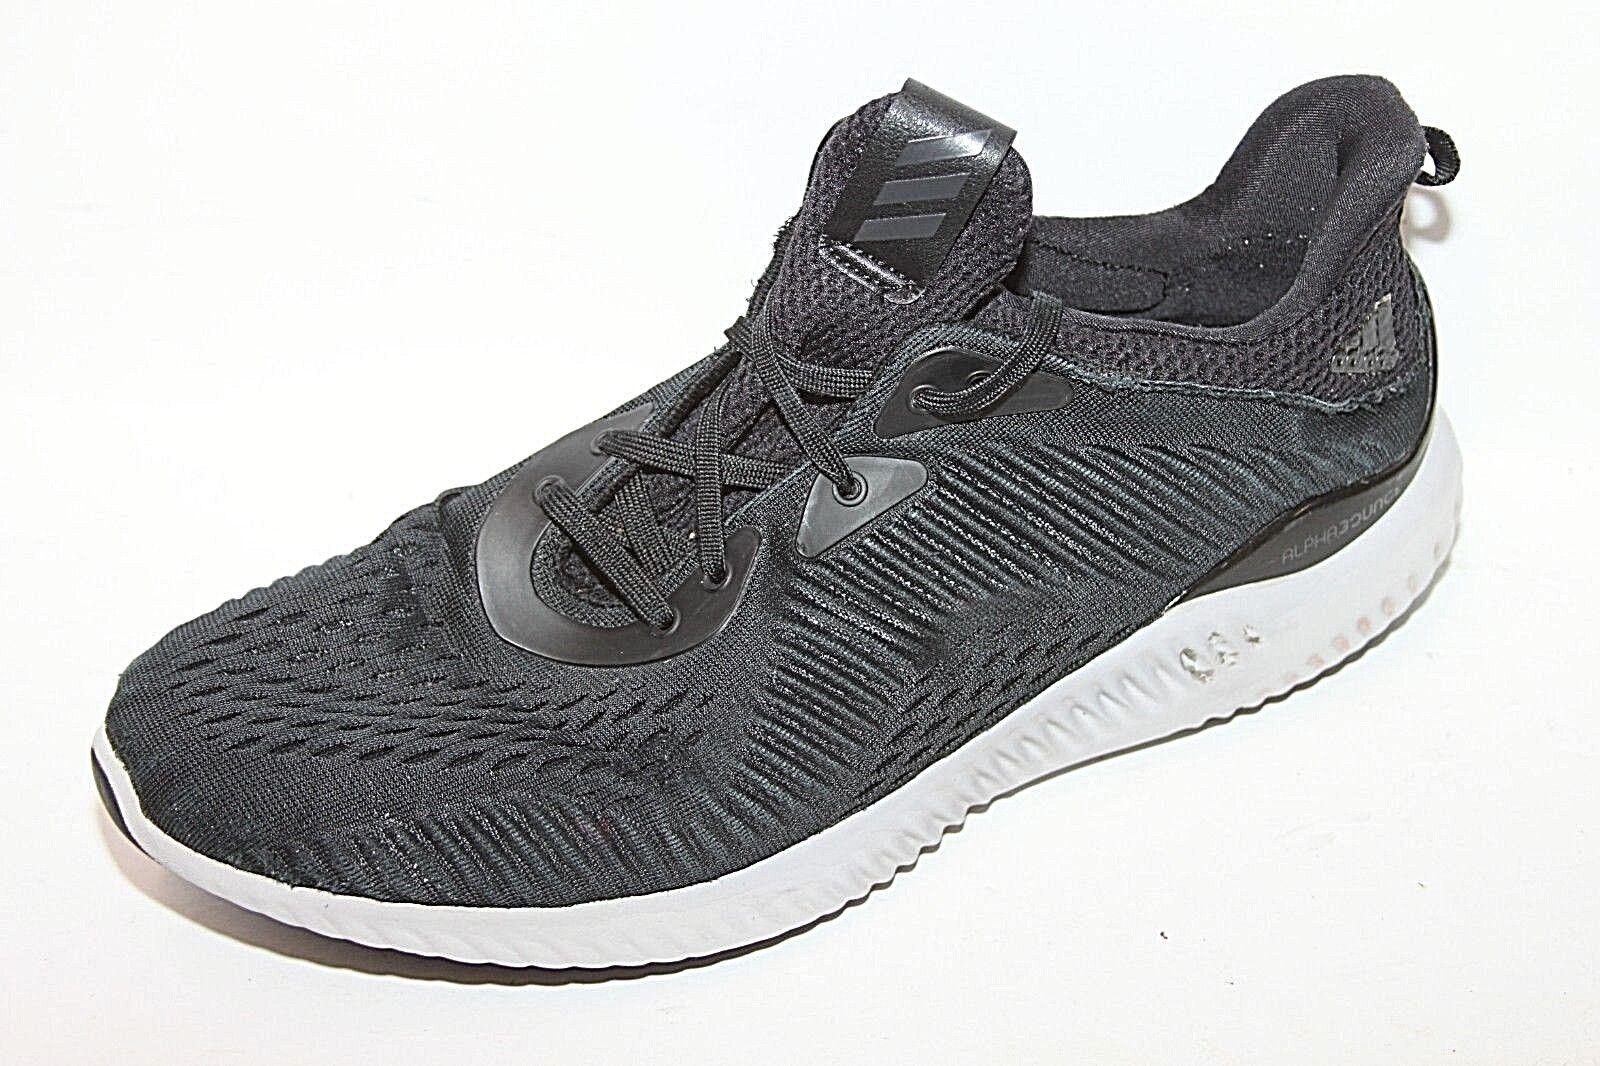 hará Galleta detergente  adidas Alphabounce EM M Black/grey By4264 Men's Sz 10 for sale online | eBay